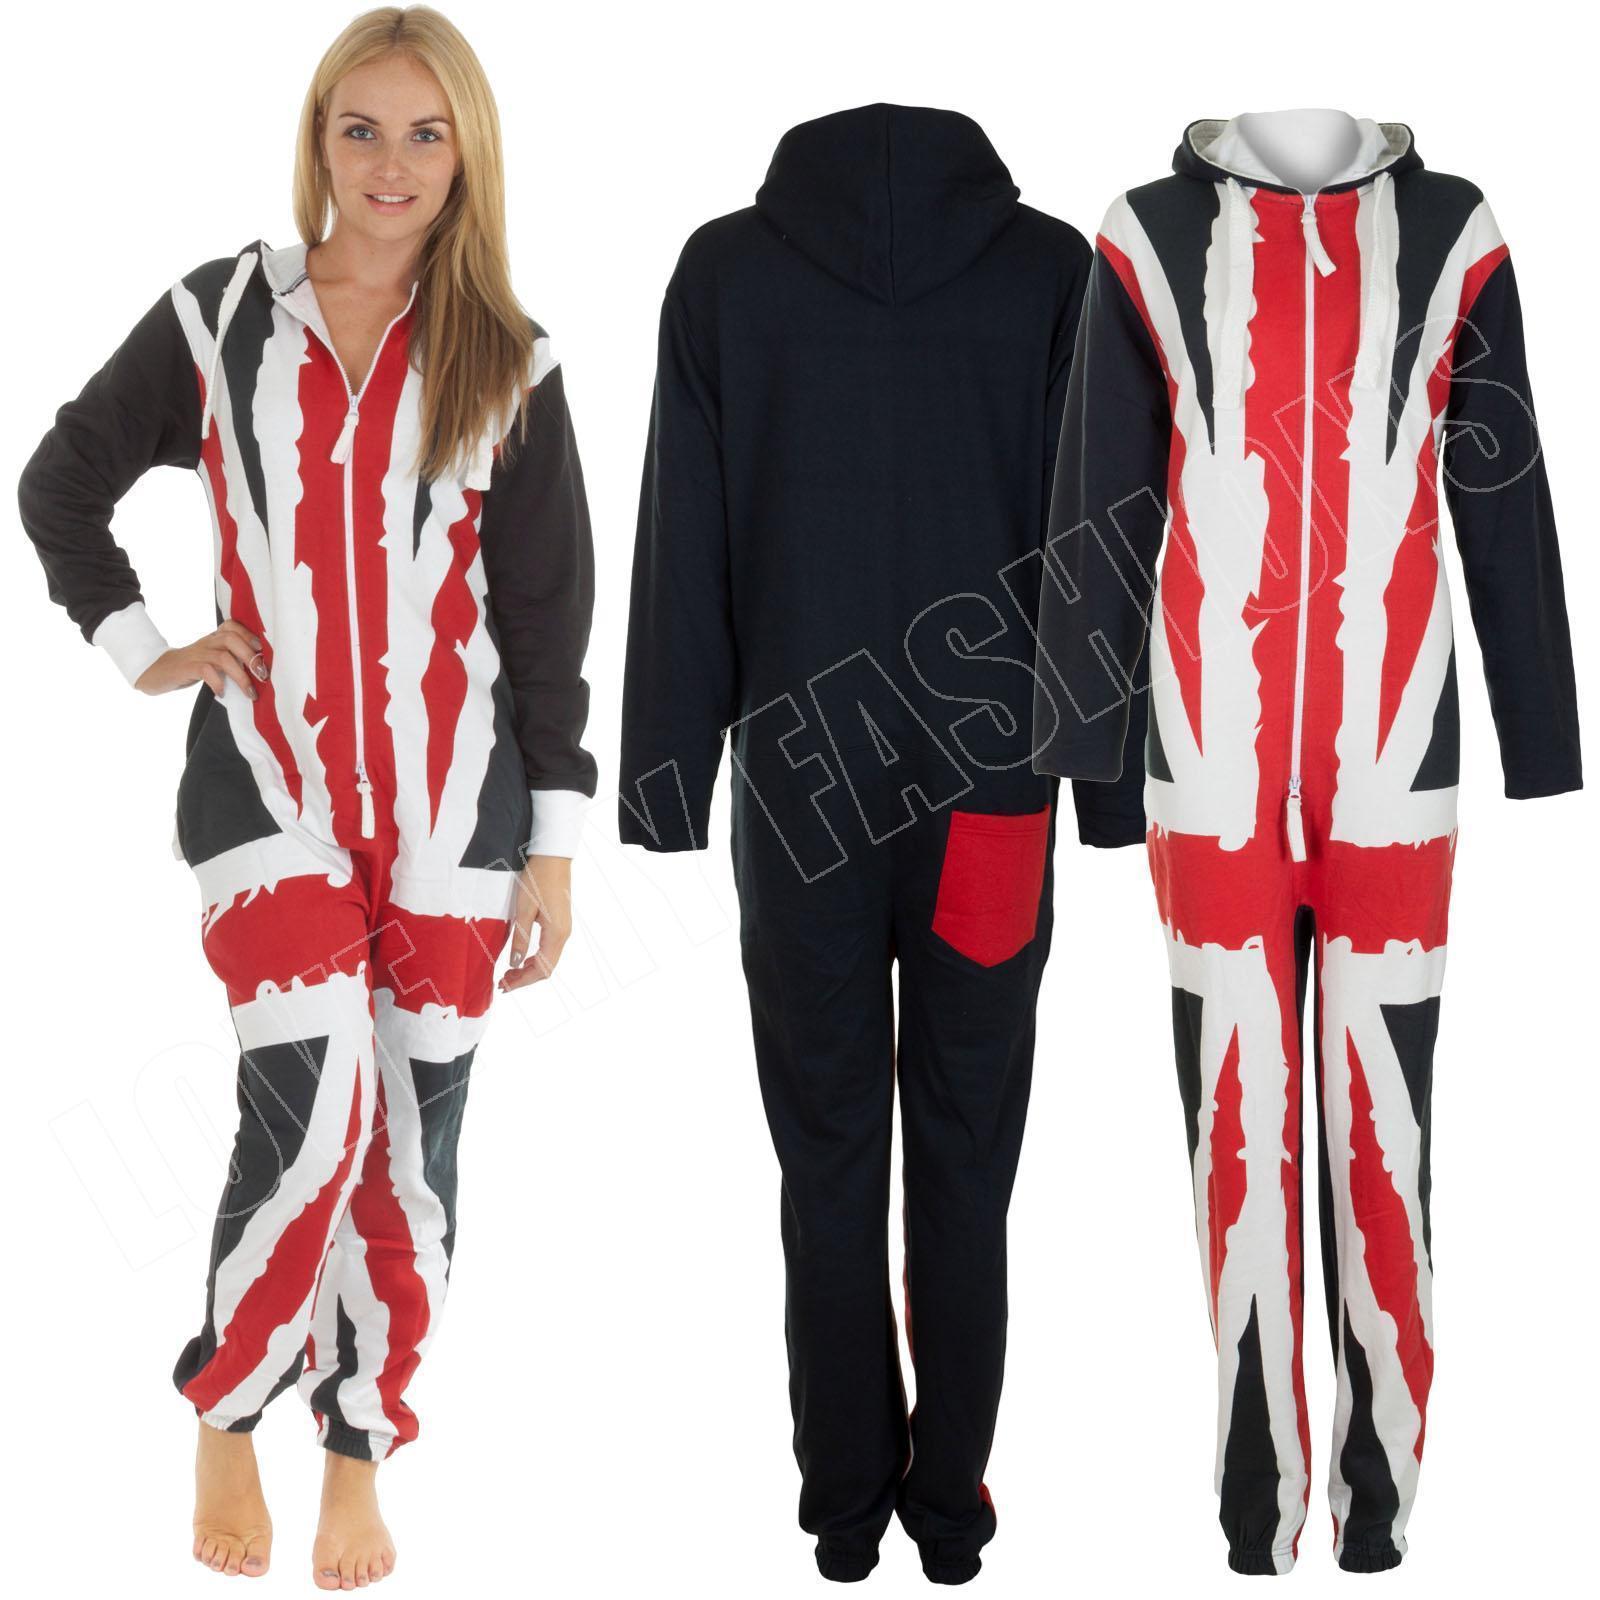 Co Unisex Union Jack Onesie Sleepwear